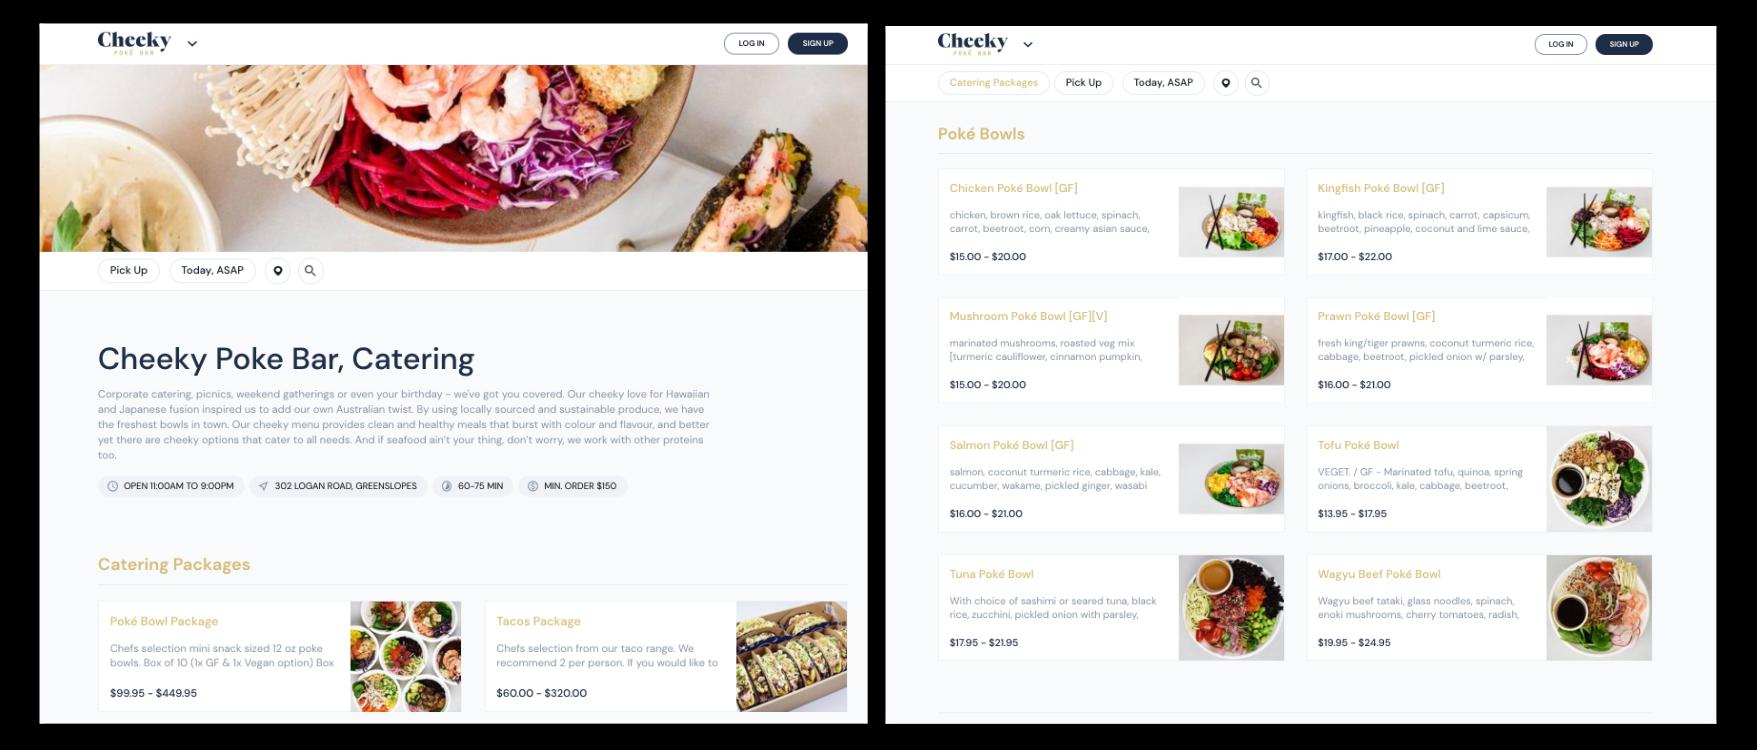 Cheeky Poke Bowl online menu on Bopple